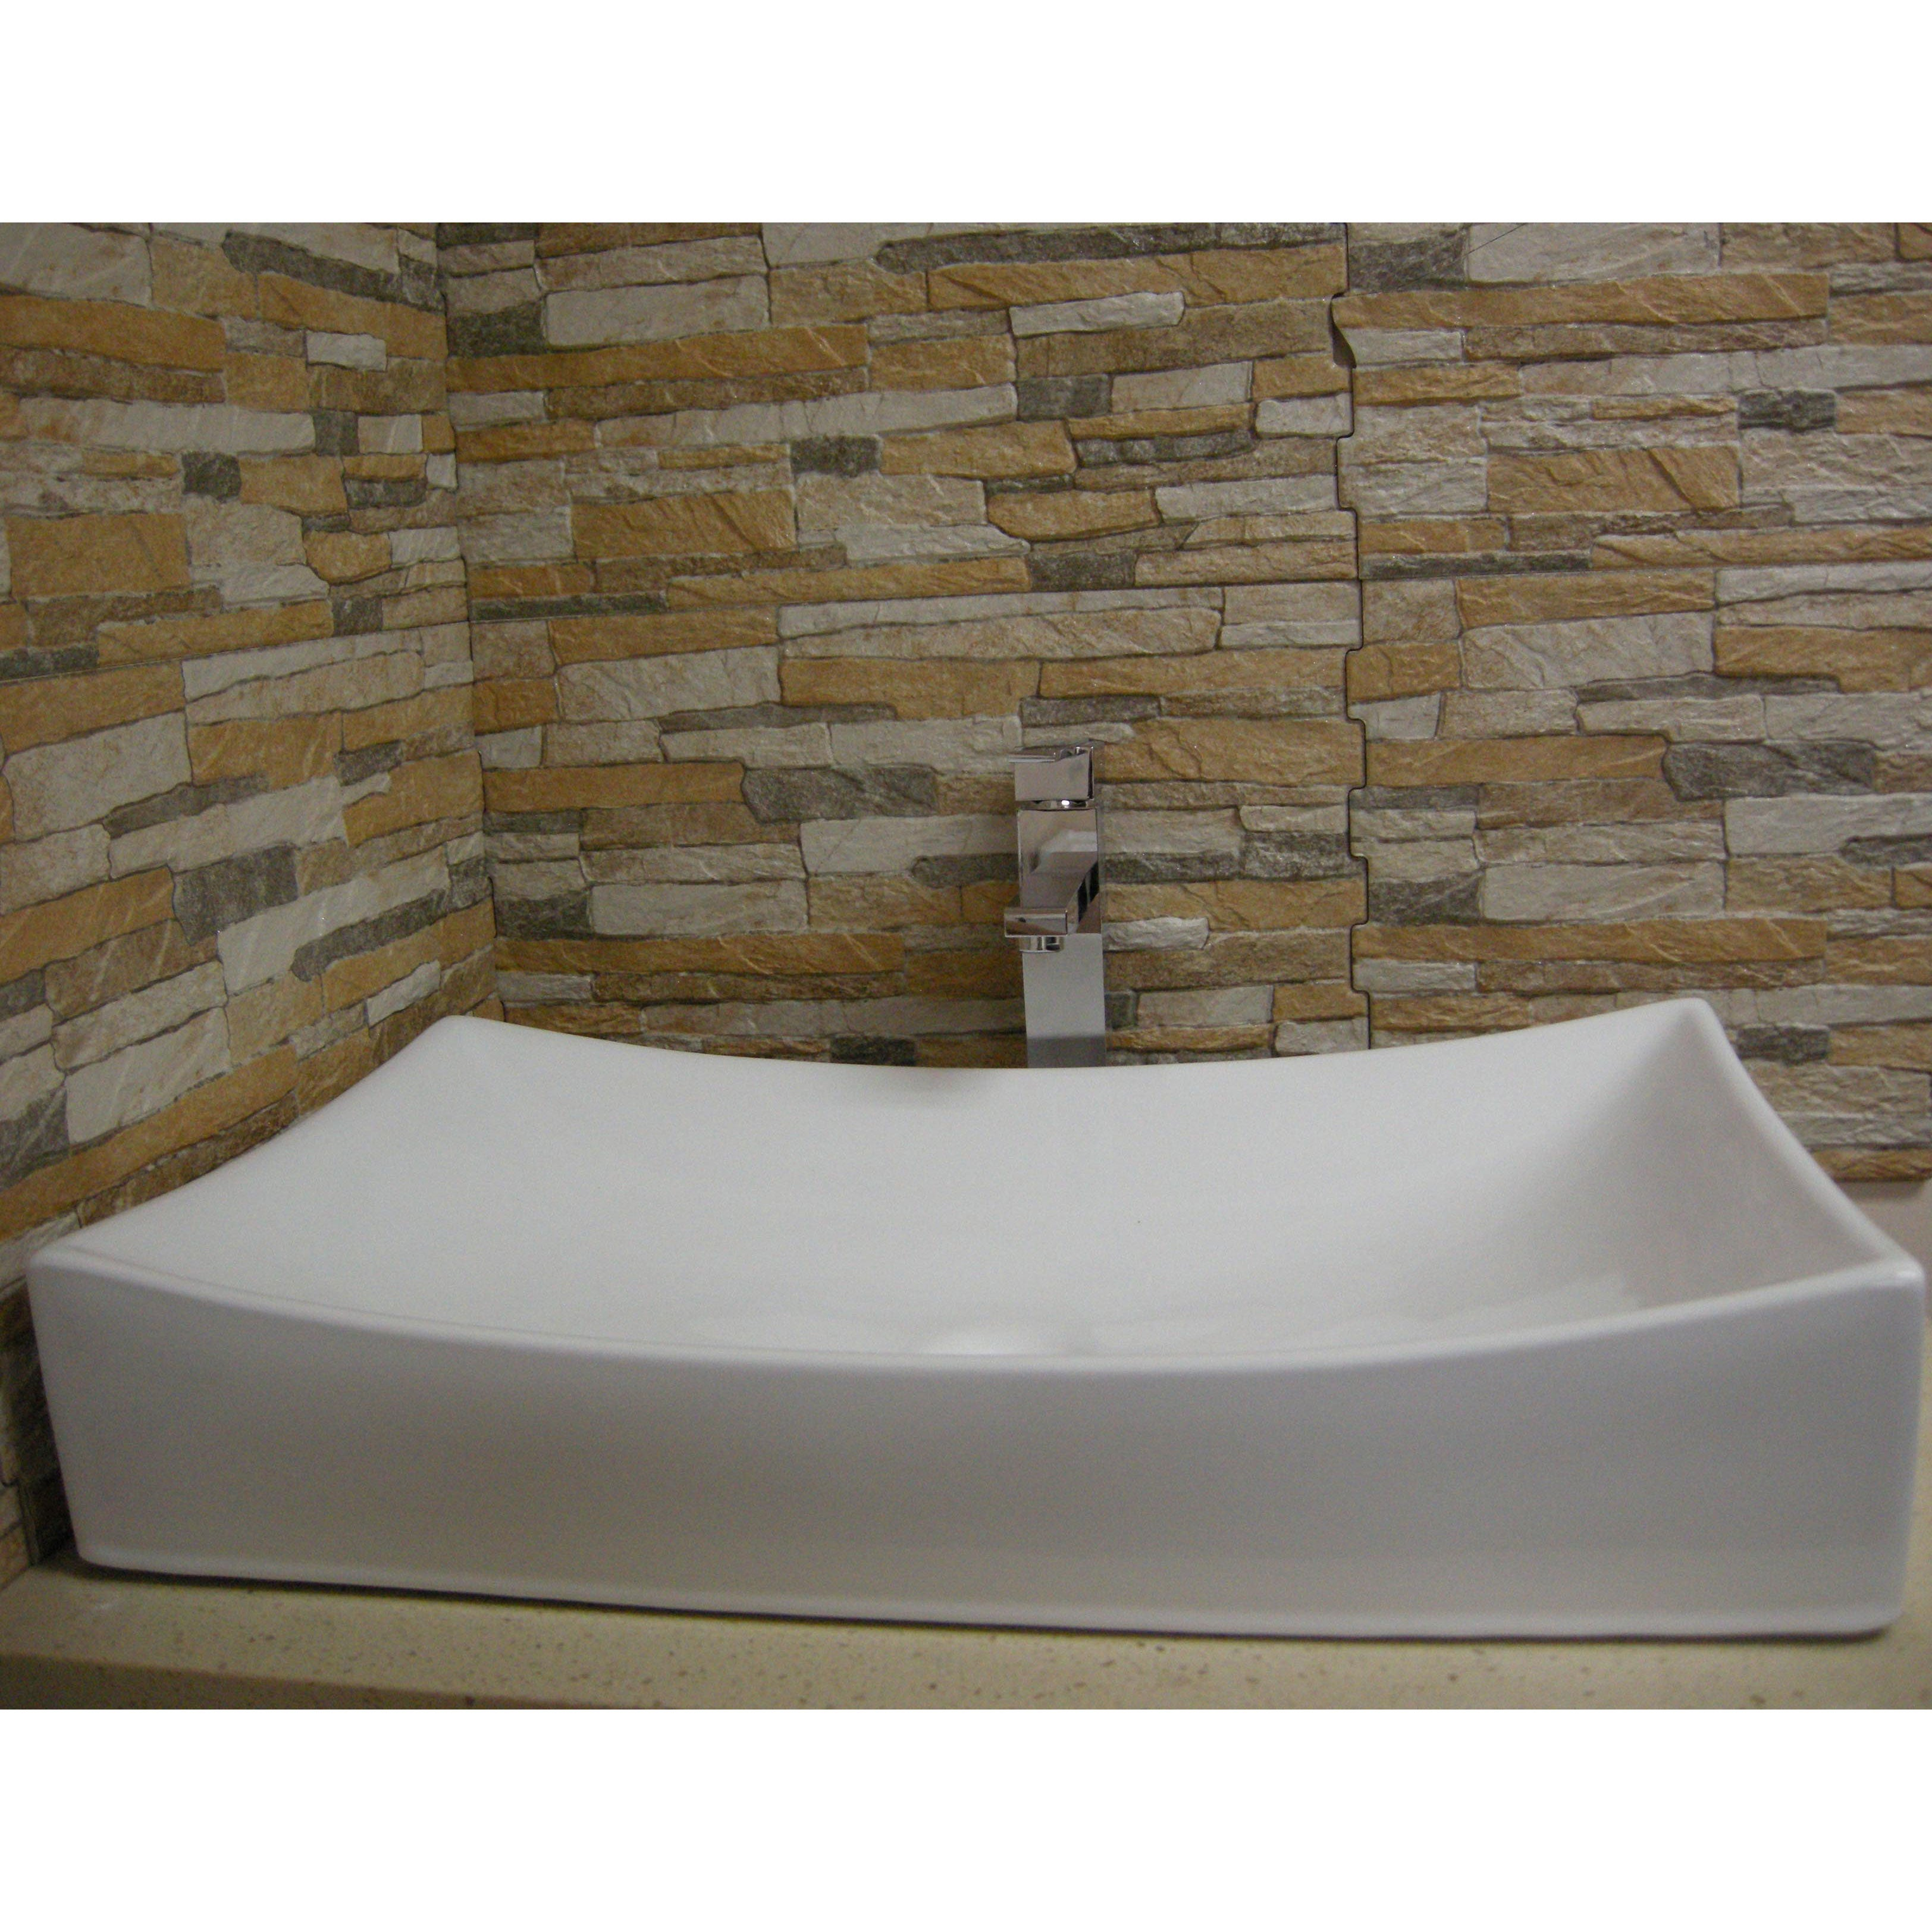 Fine Fixtures White Ceramic Chinaware 26-inch Vessel Sink...